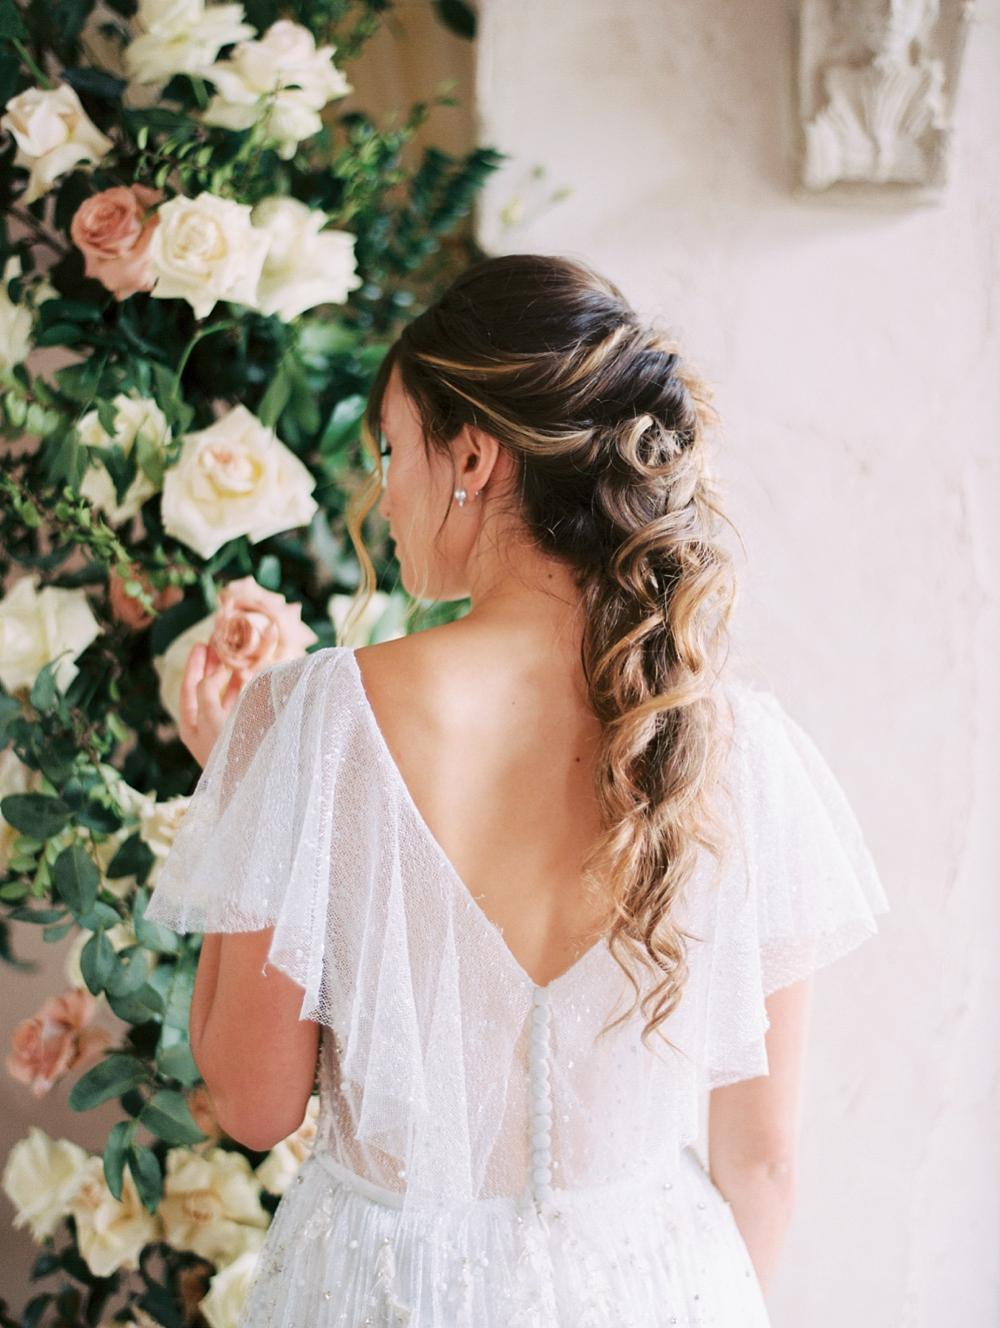 kristin-la-voie-photography-Austin-Wedding-Photographer-Villa-Antonia-63